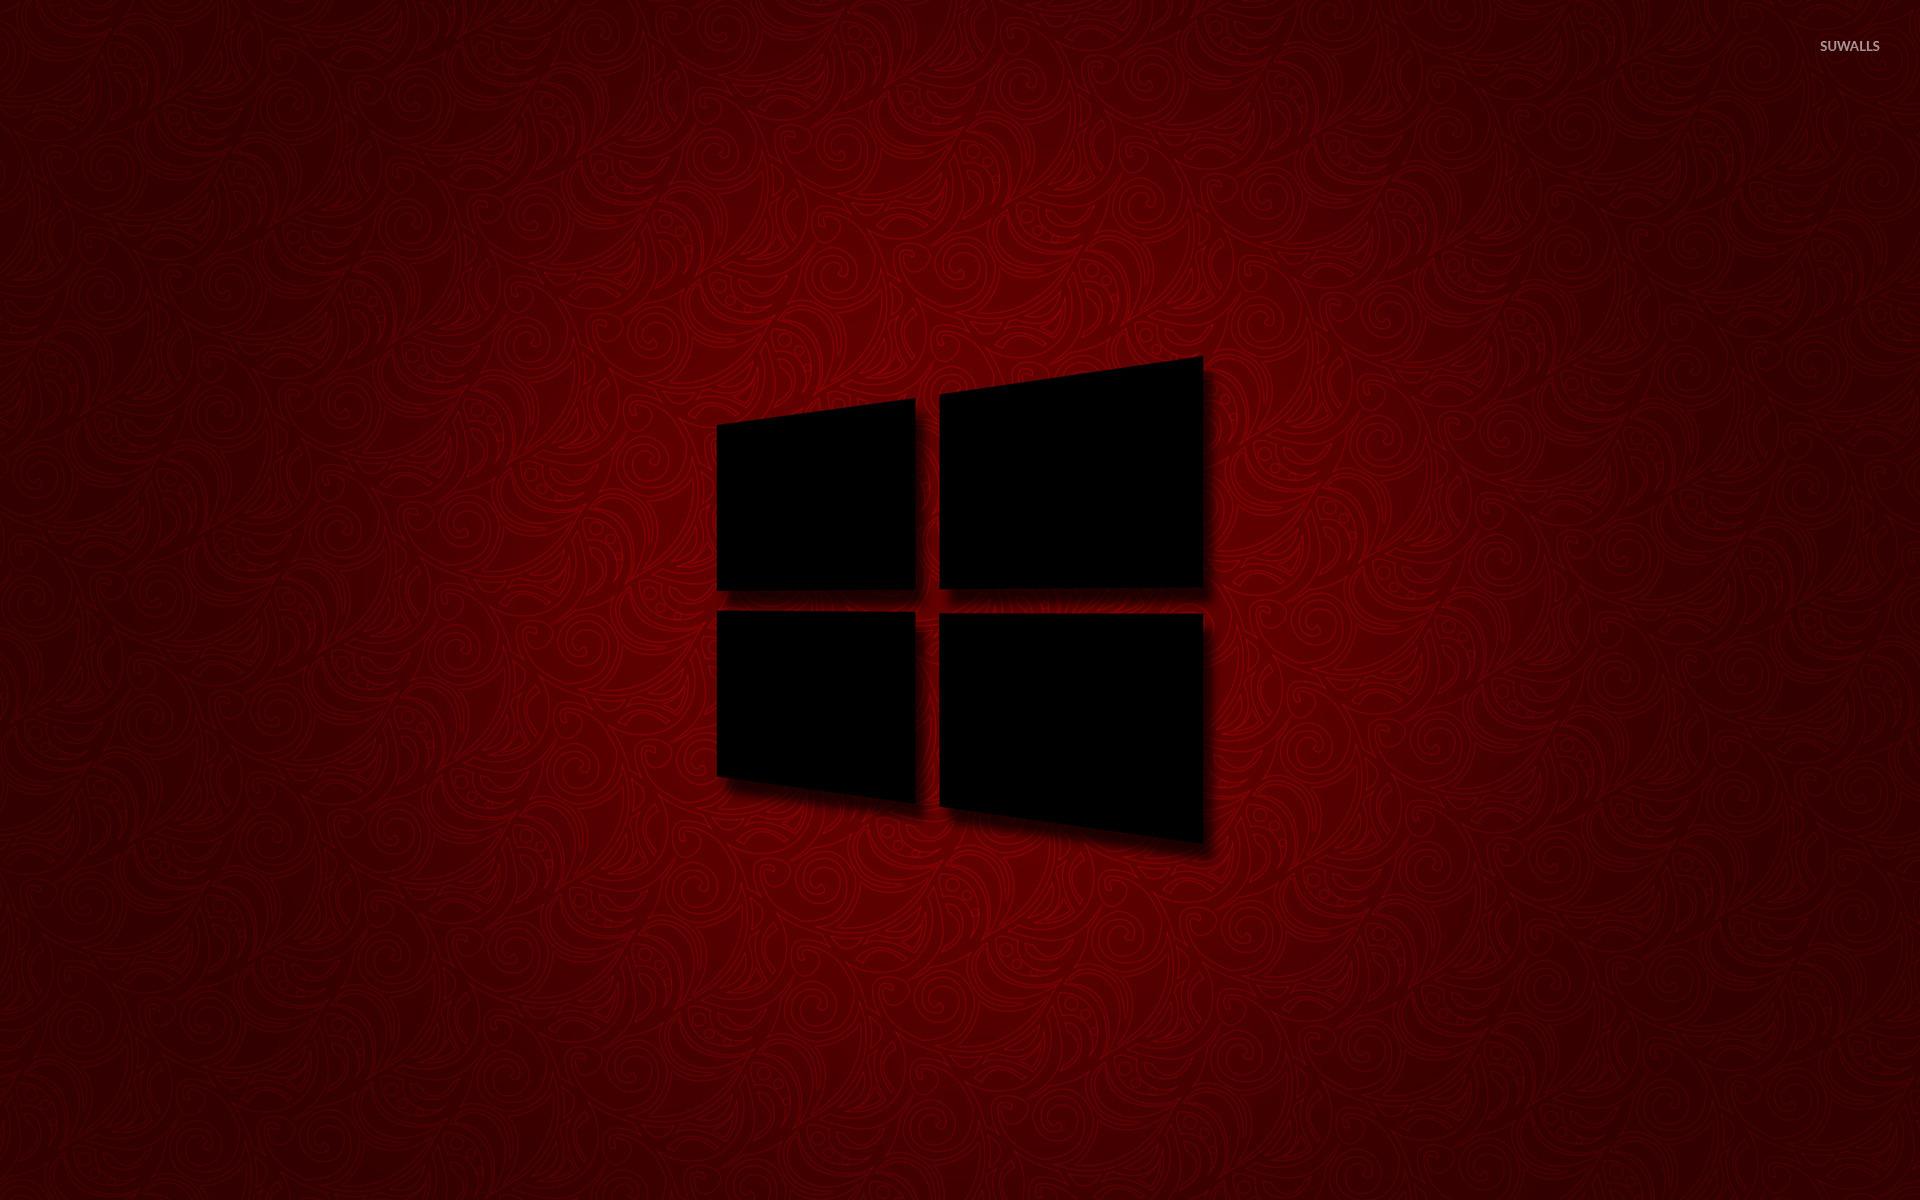 windows 10 black logo on red wallpaper computer